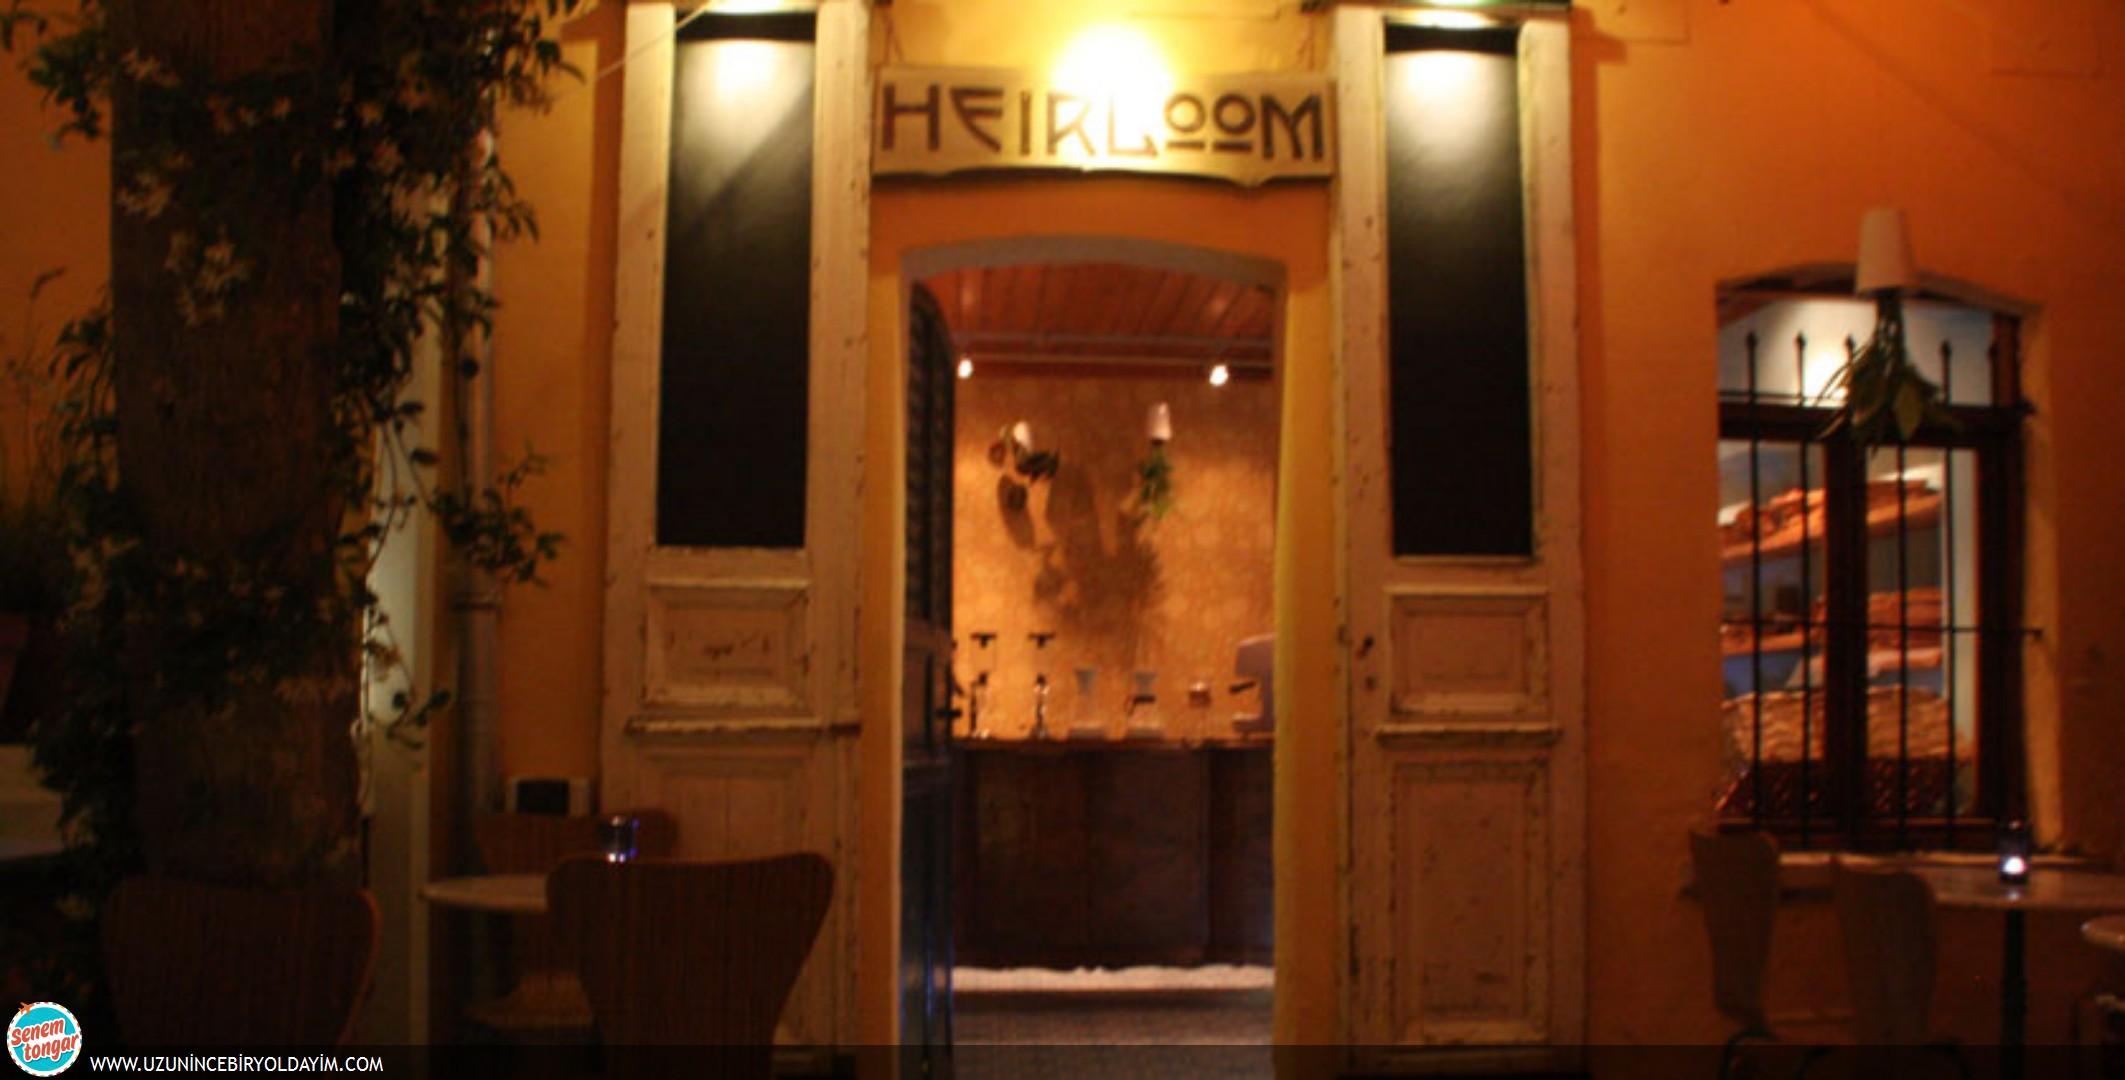 heirloom istanbul cafe